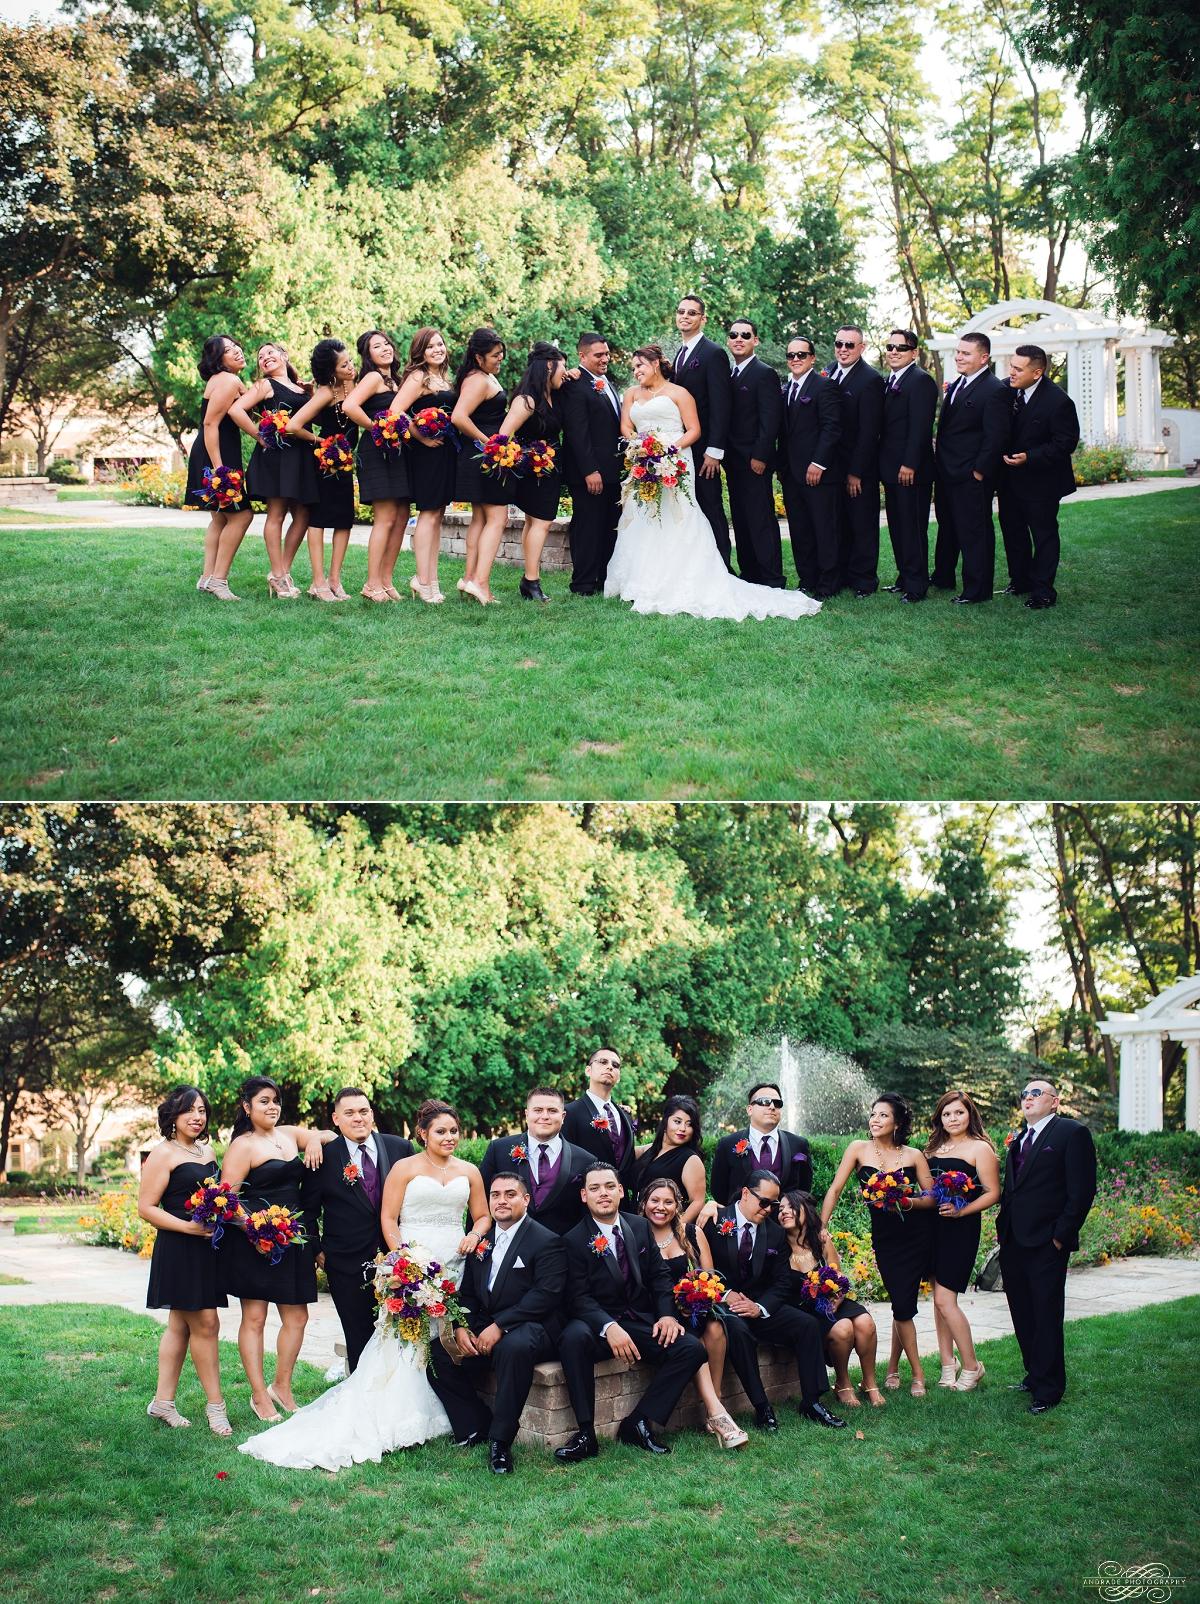 Janette + Louie Estebans Wedding Photography in Naperville - Naperville Wedding Photographer_0046.jpg